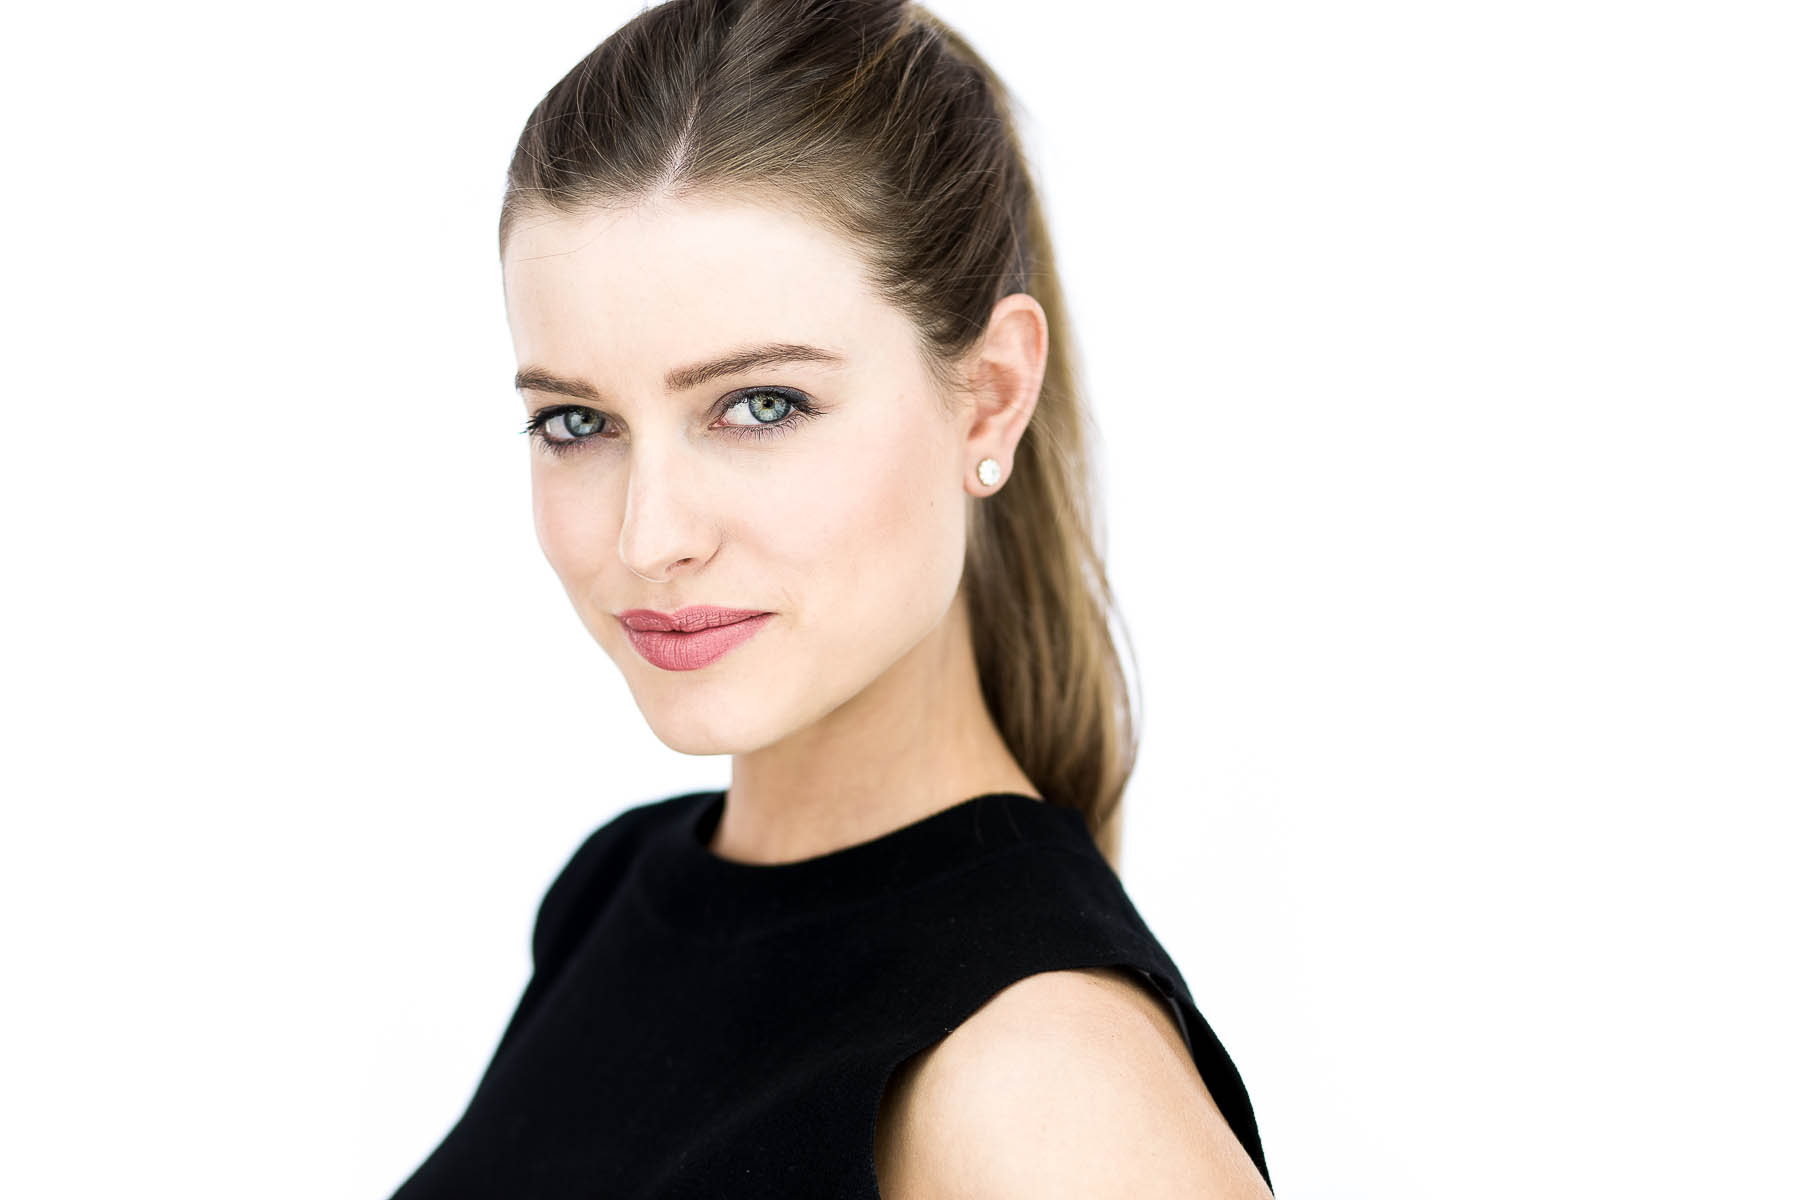 lauren-model-professional-headshots-25.jpg